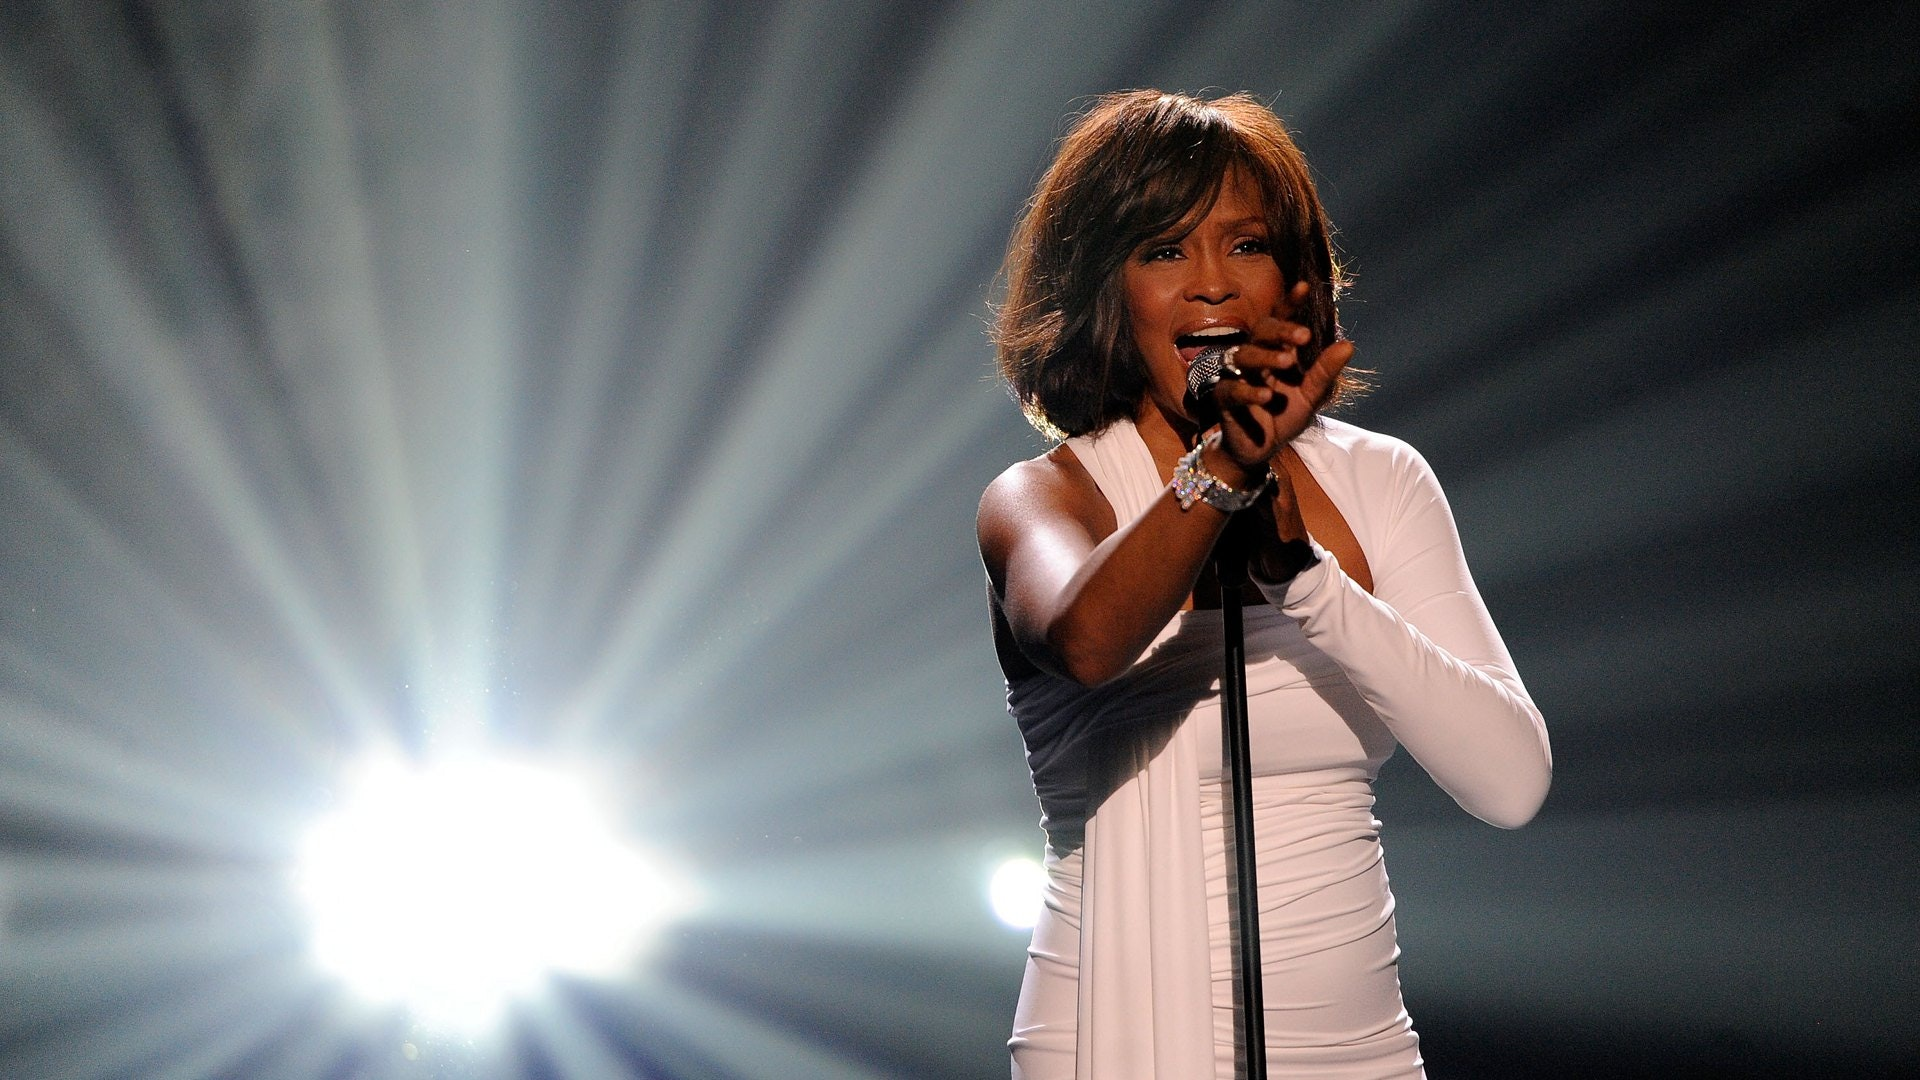 How Great Thou Art Whitney Houston